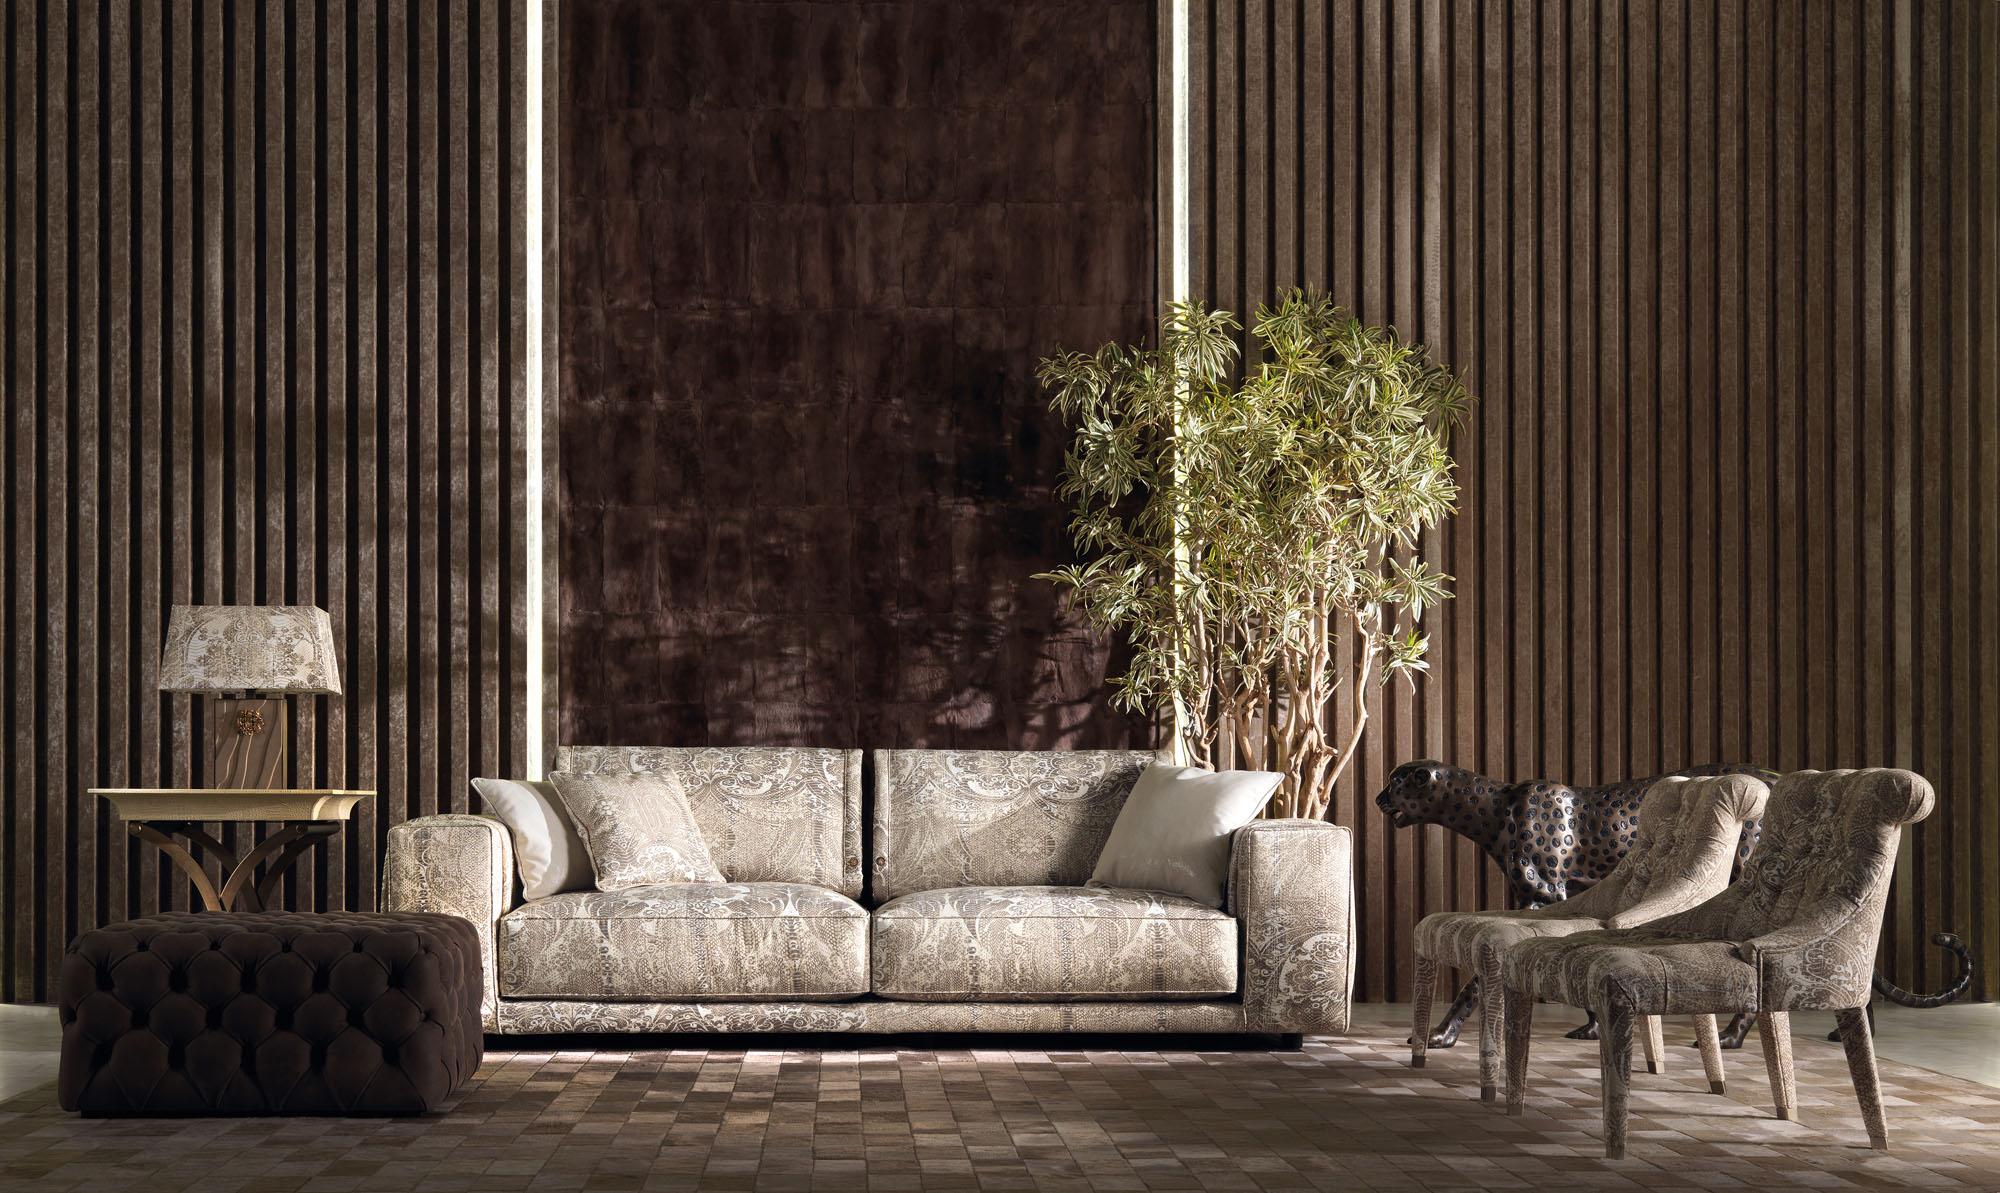 Roberto Cavalli Home夏日丛林系家具,狂野之外的惊喜